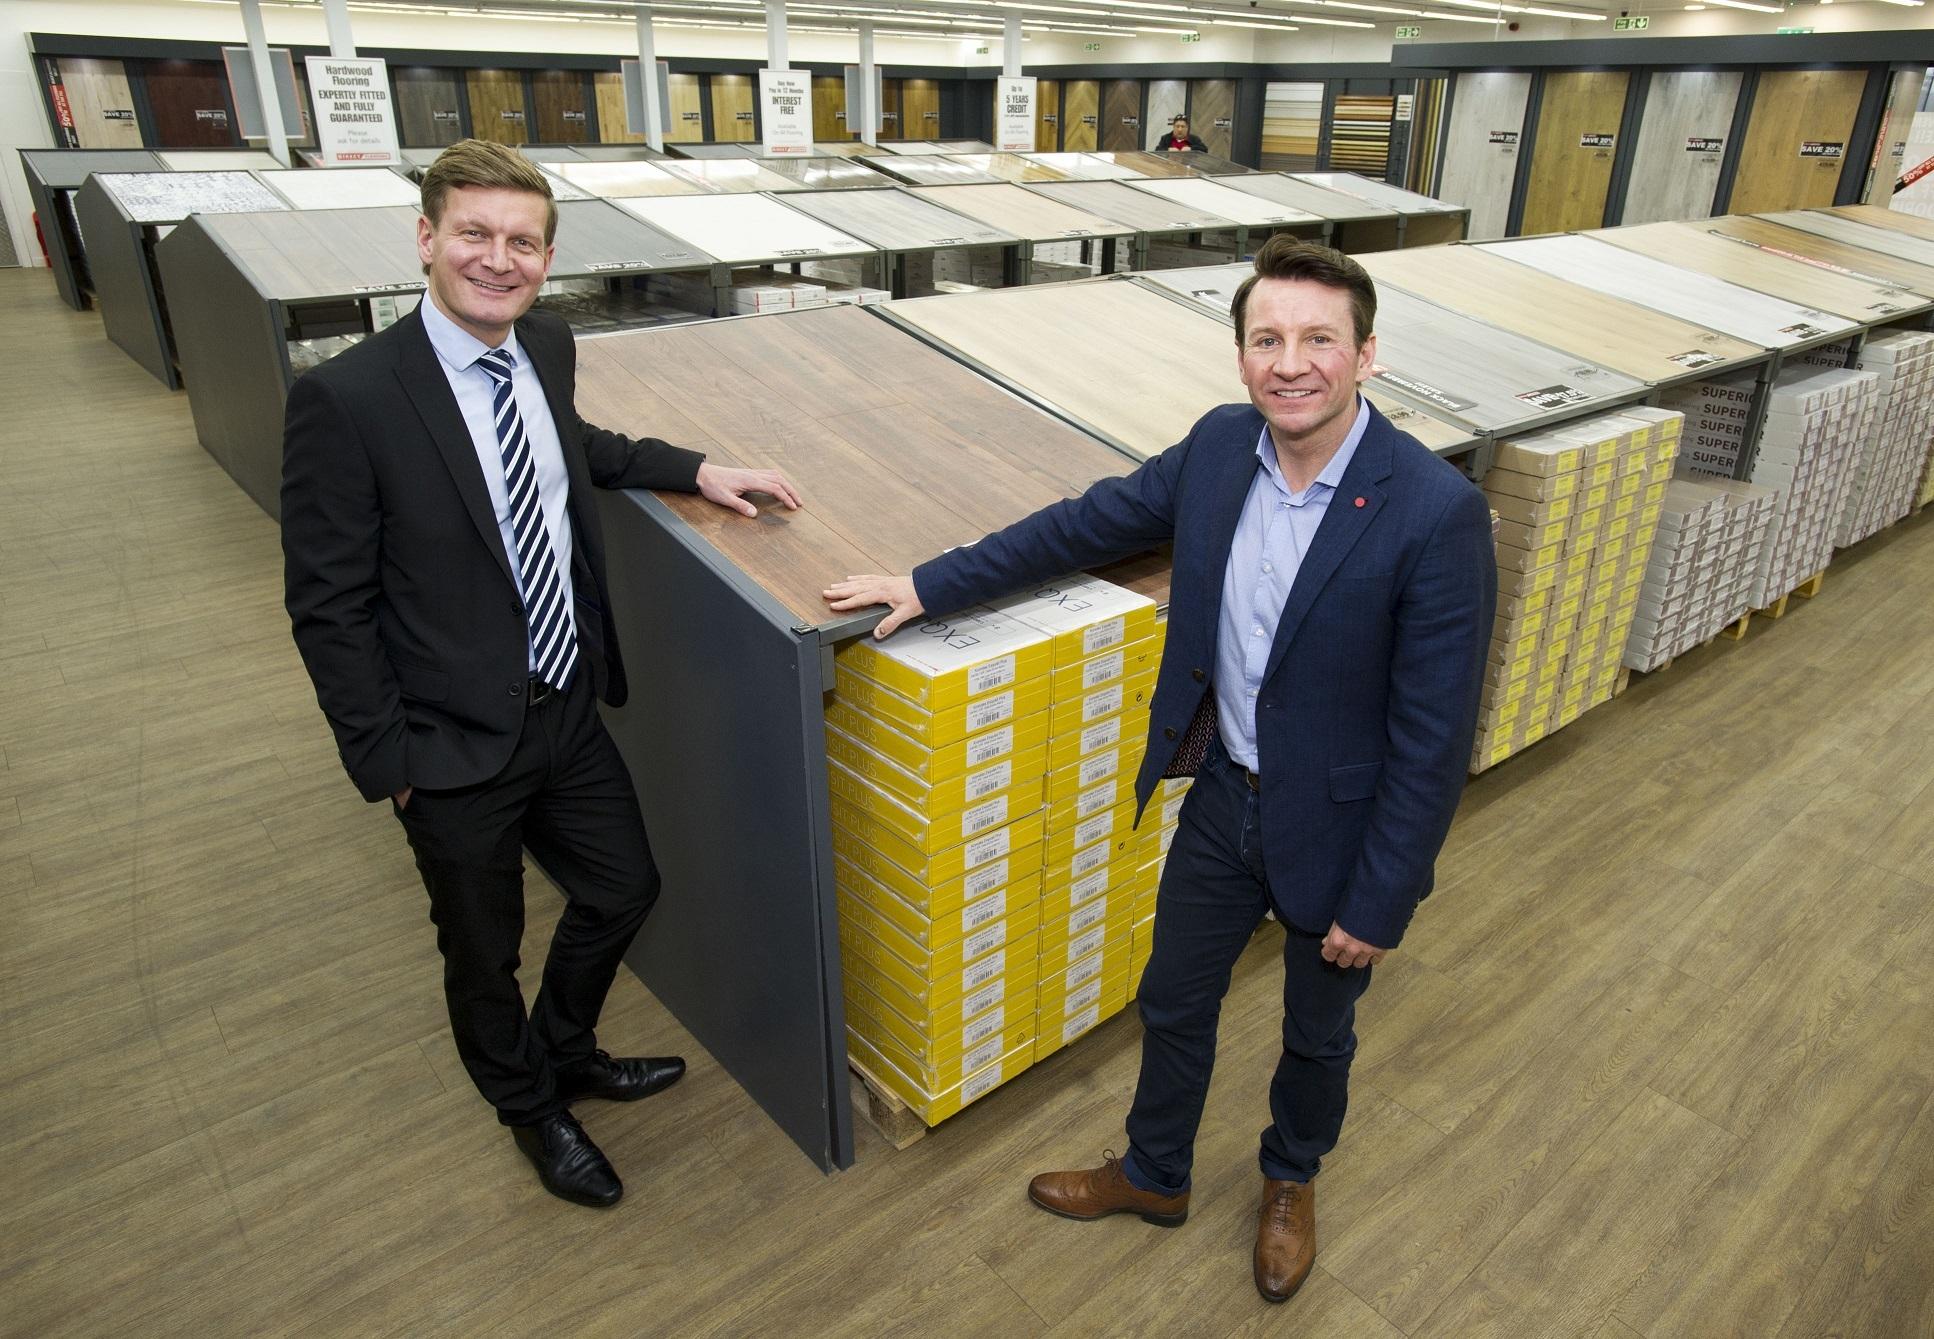 Flooring retailer expands in Scotland amid tough times on the high street - HeraldScotland